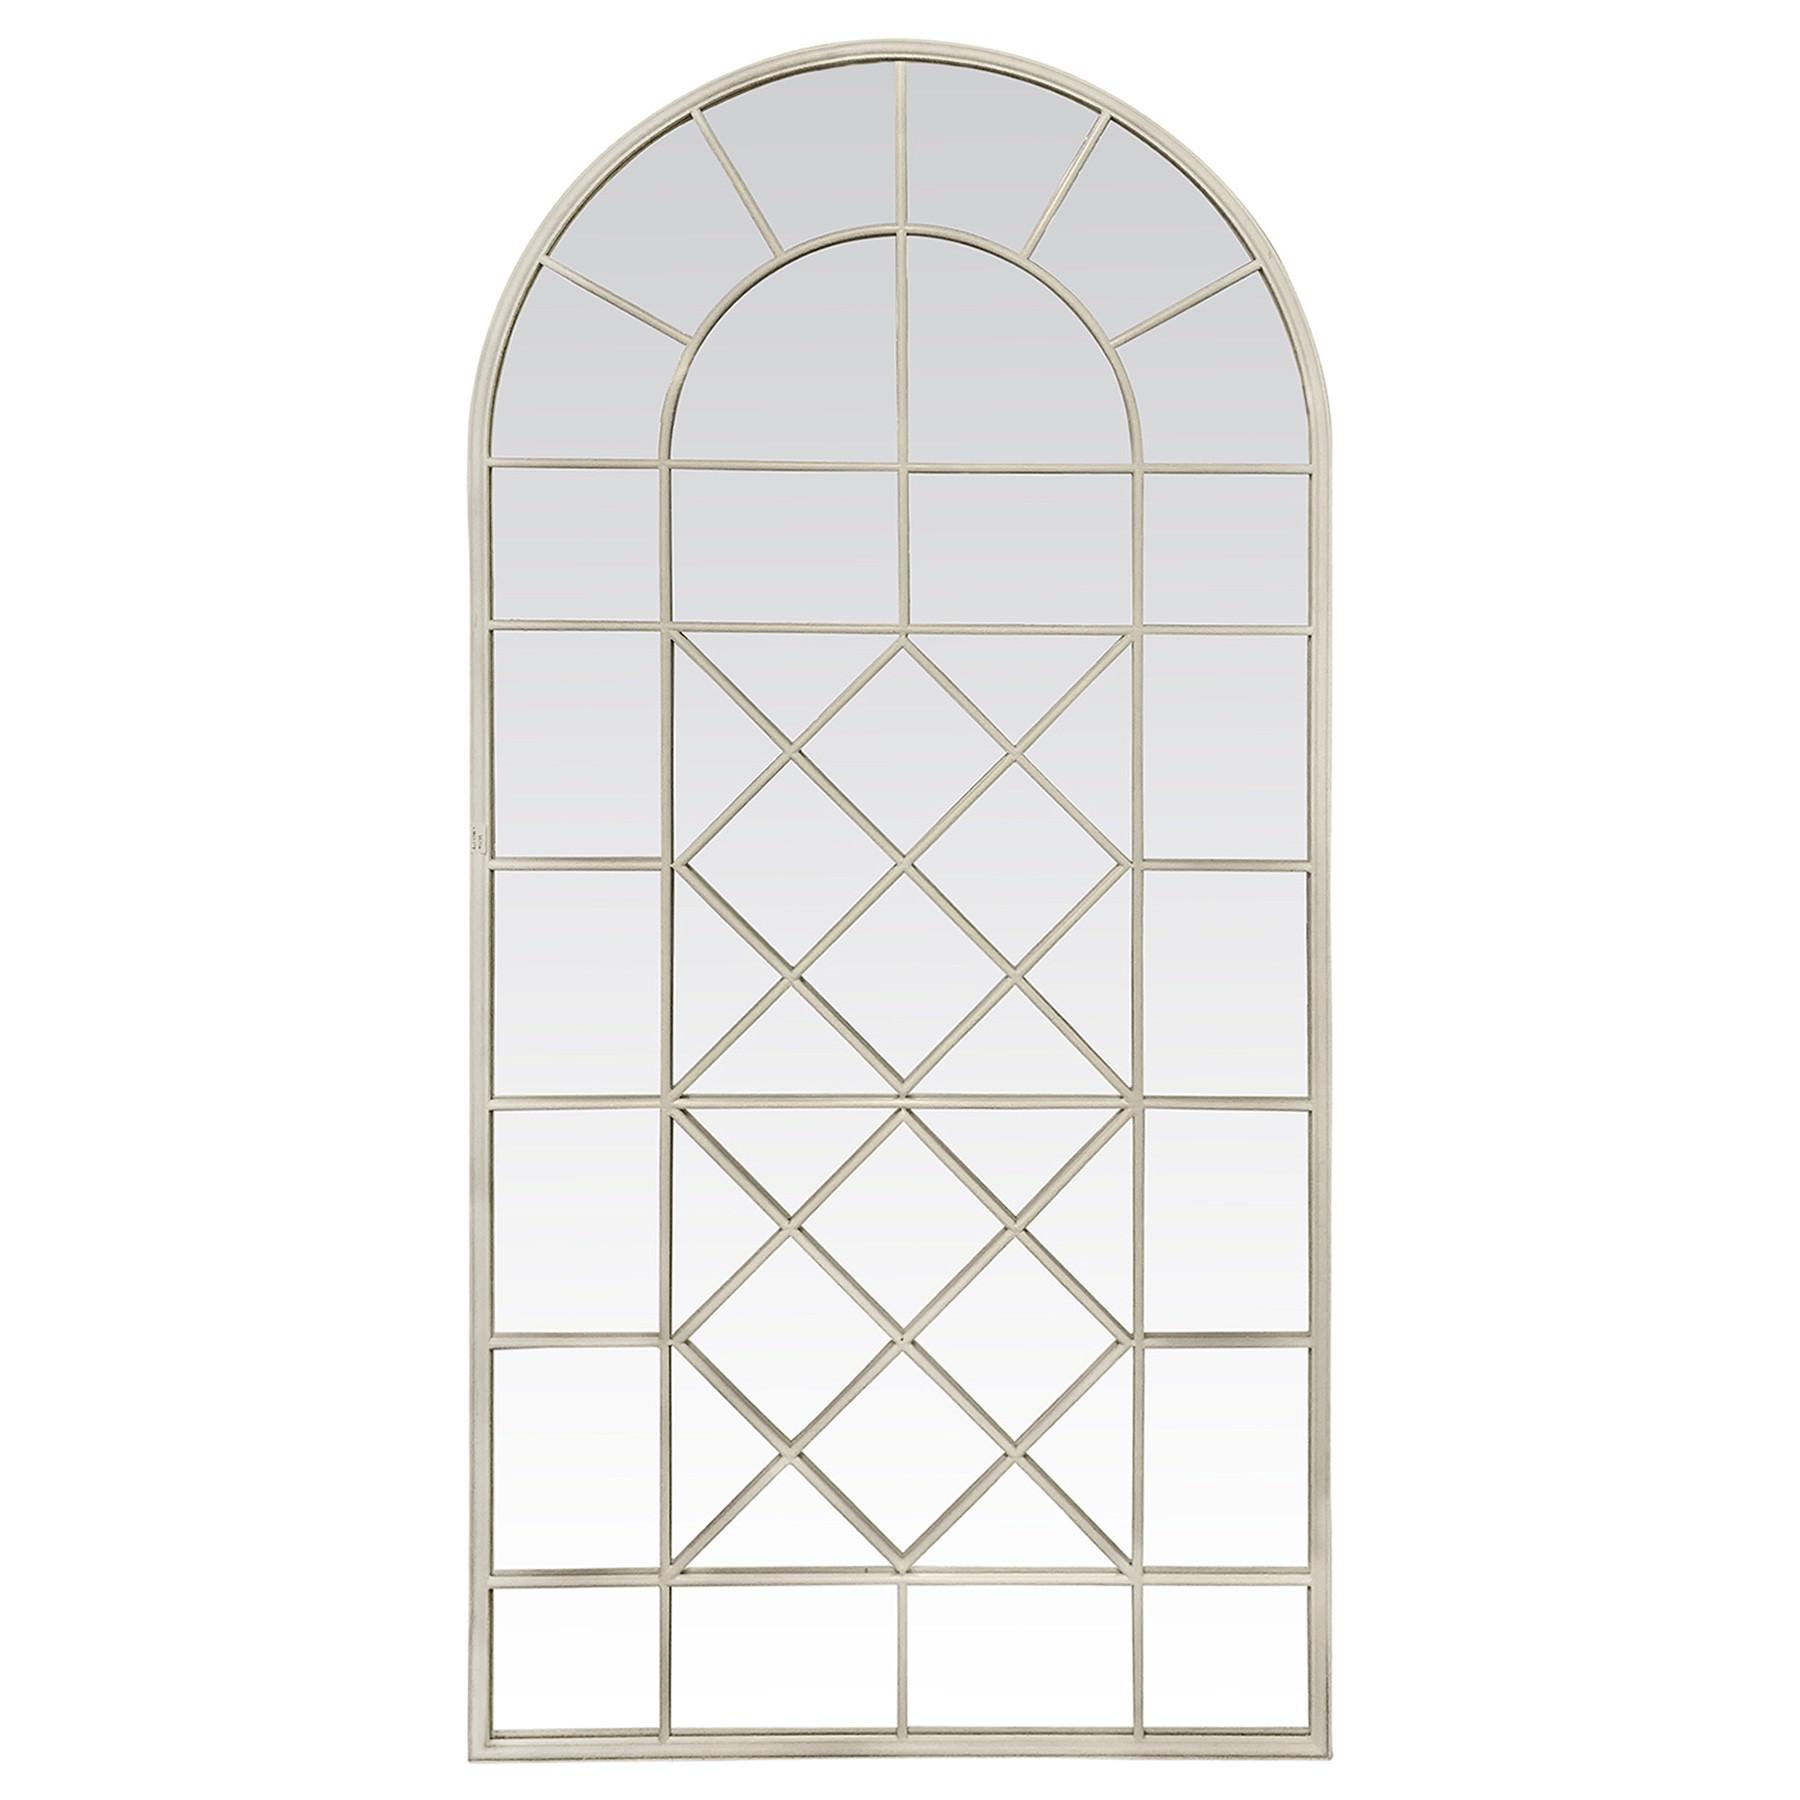 Galloway Iron Arch Window Floor Mirror, 225cm